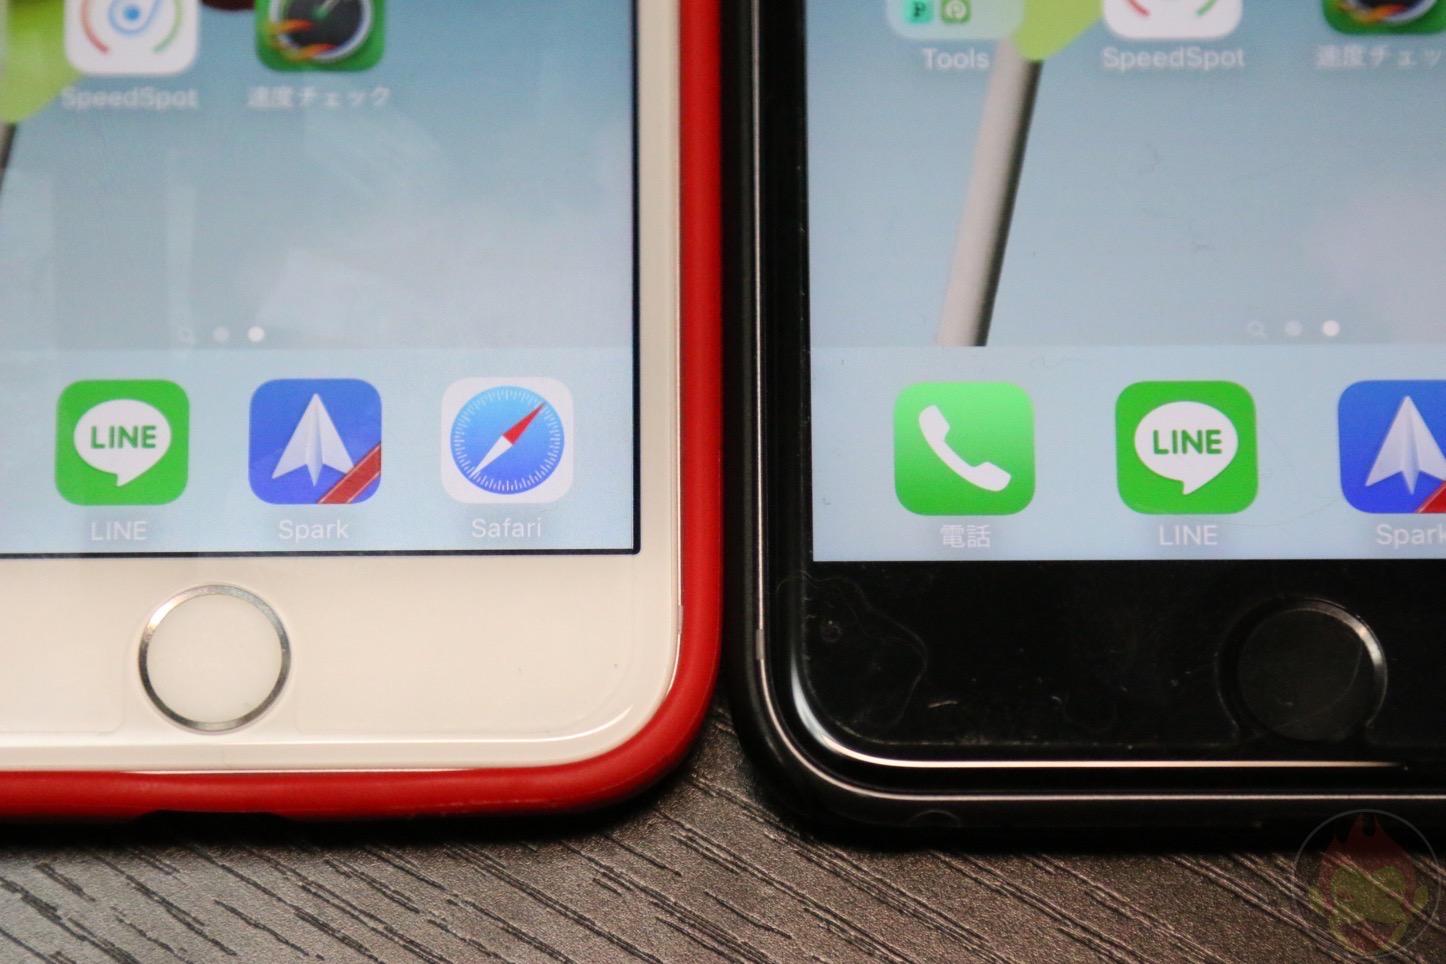 iPhone6s-6splus-comparison-benchmark-tests-39.JPG